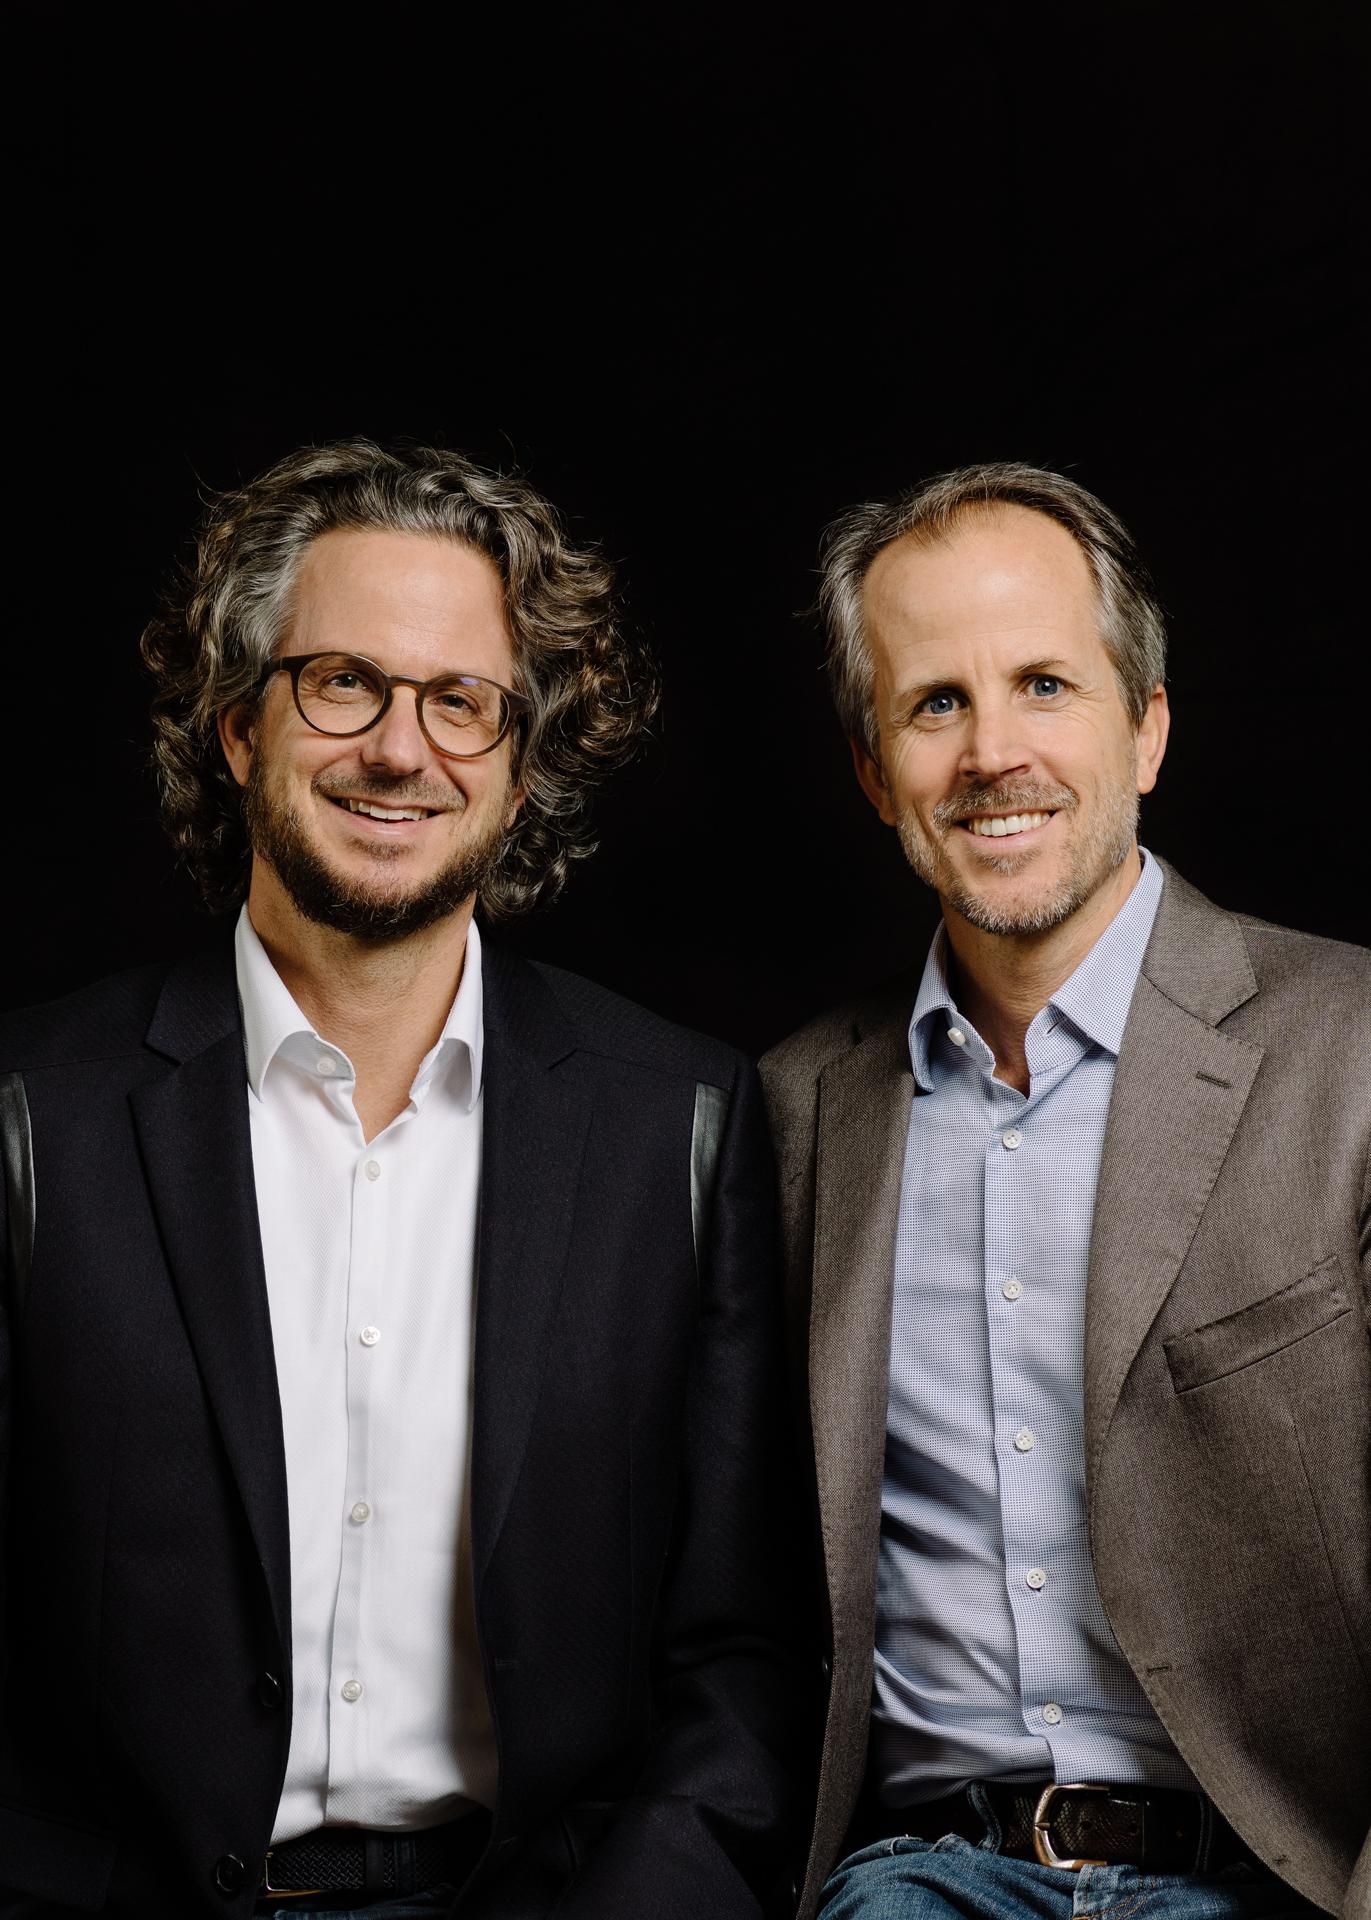 Daniel and Andrea Sennheiser, co-CEOs of Sennheiser